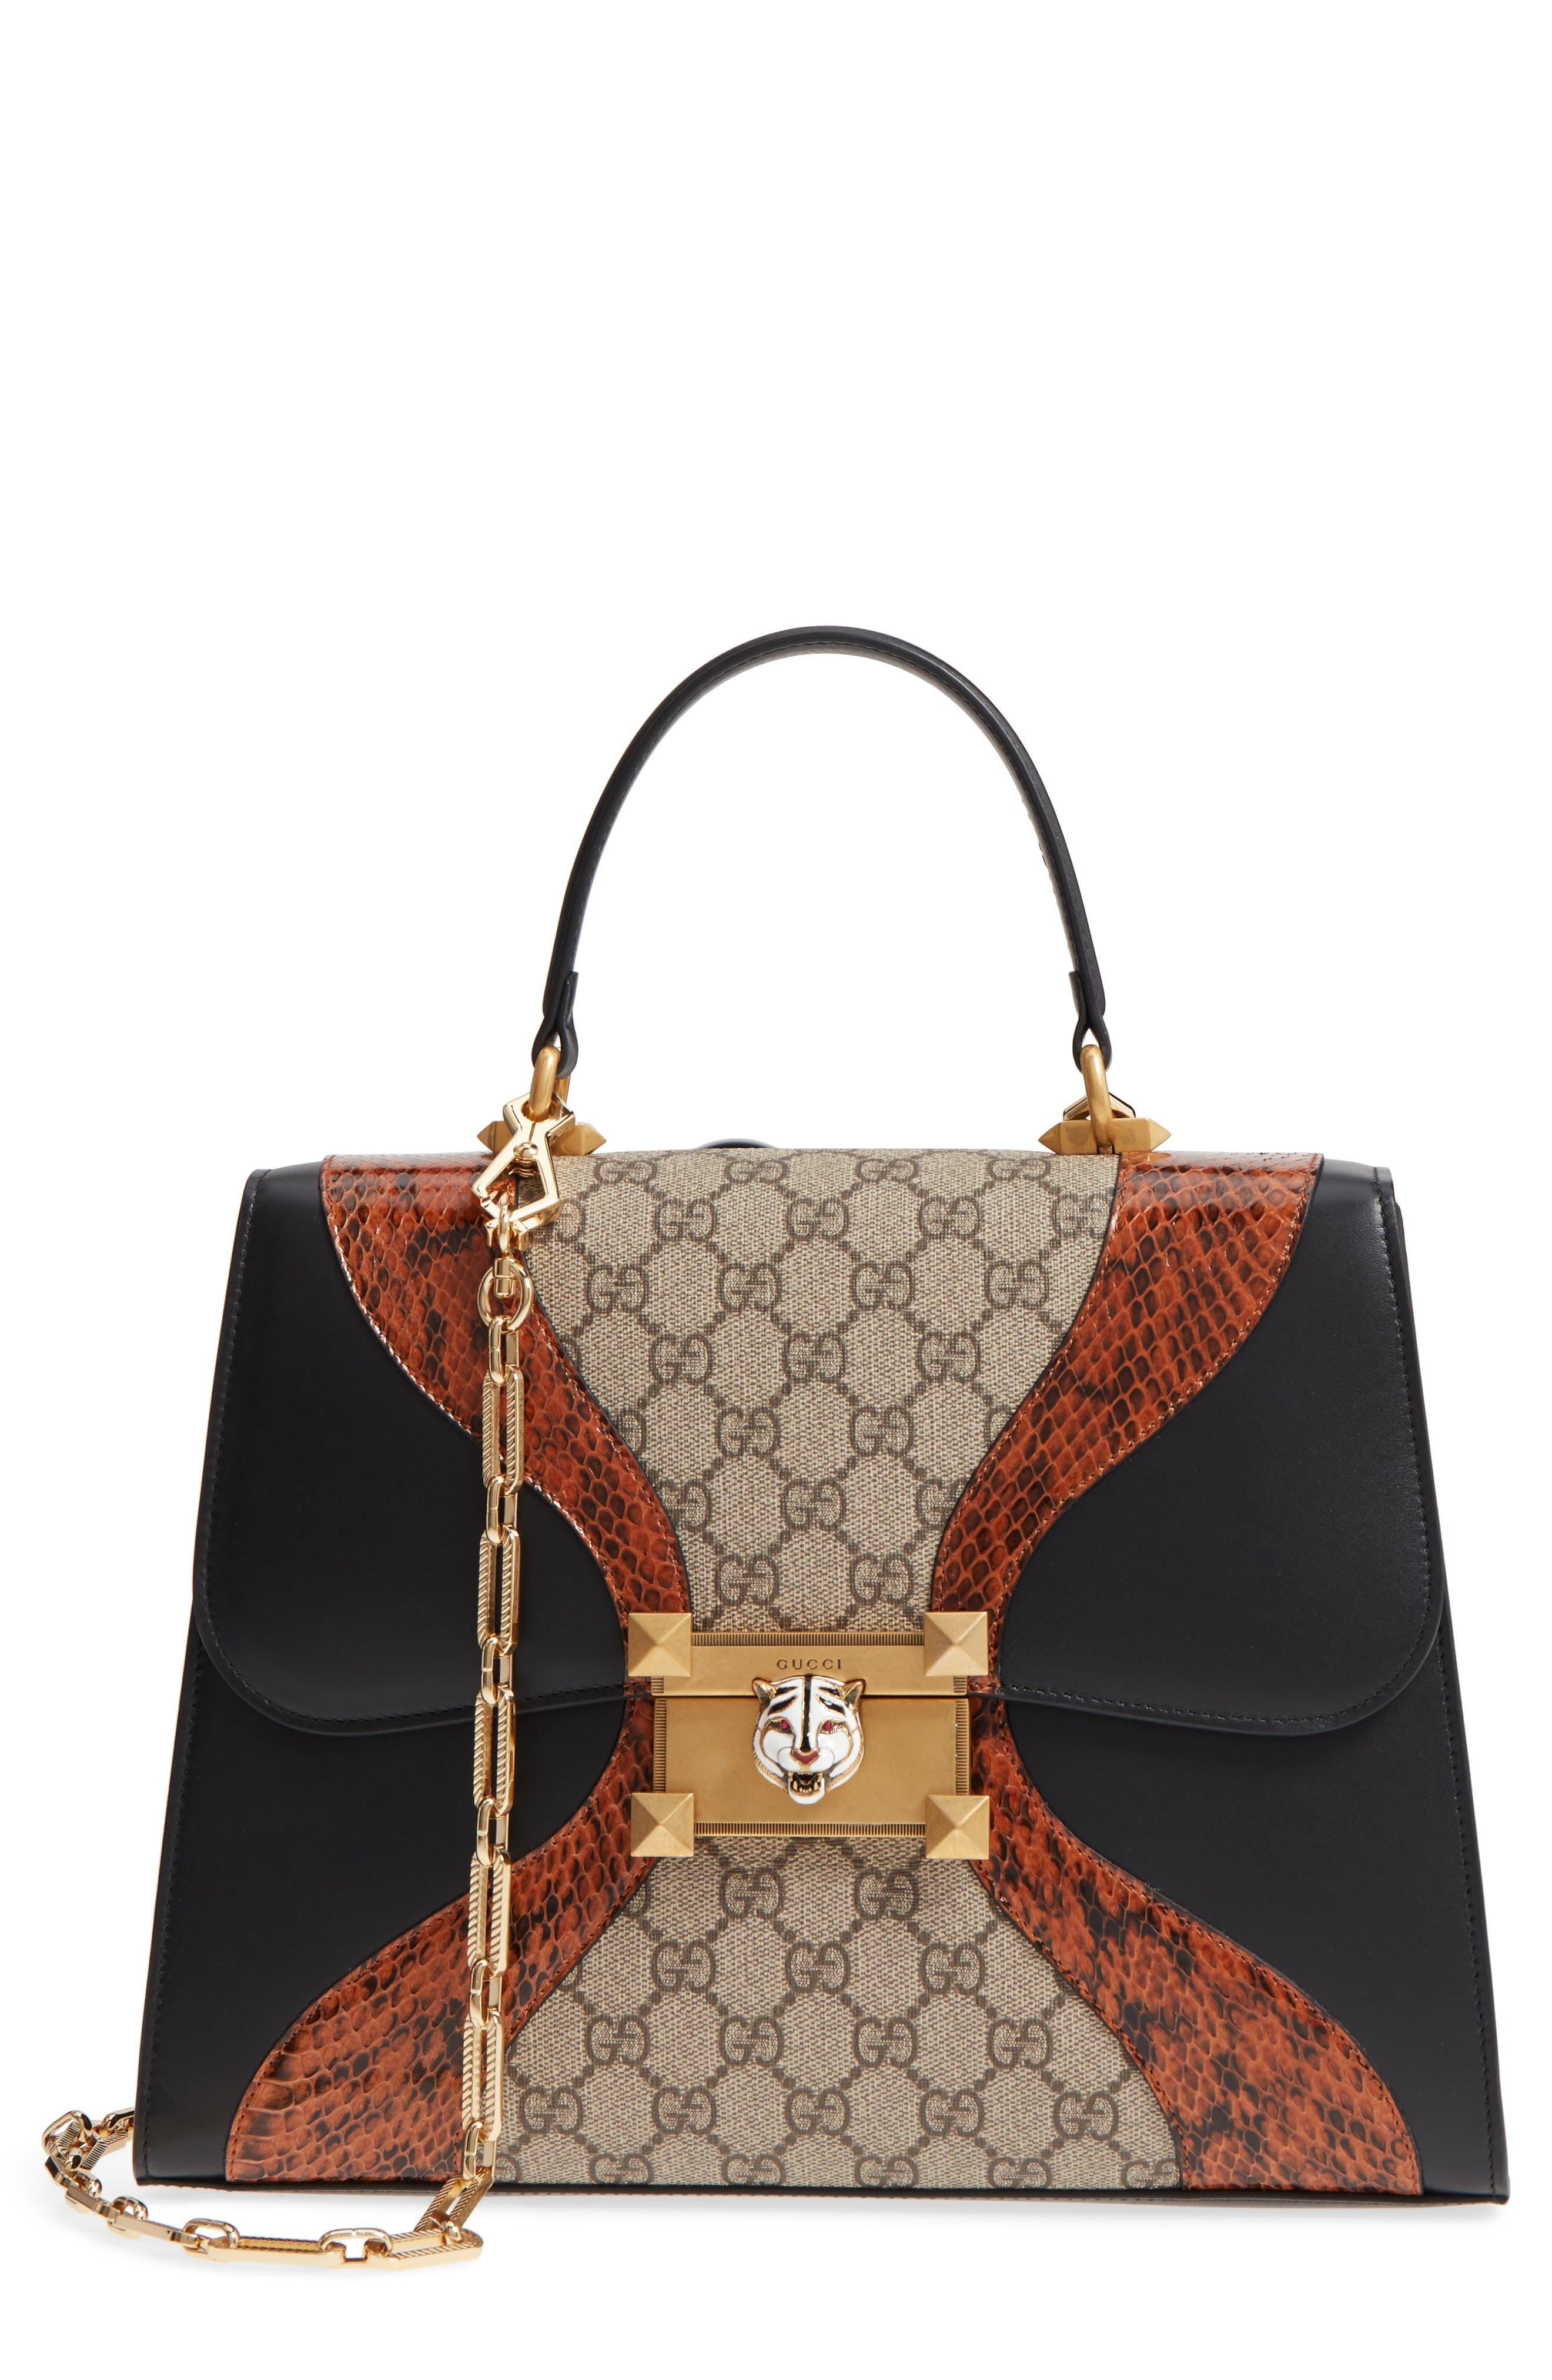 Gucci Osiride Leather, Genuine Snakeskin & GG Supreme Satchel